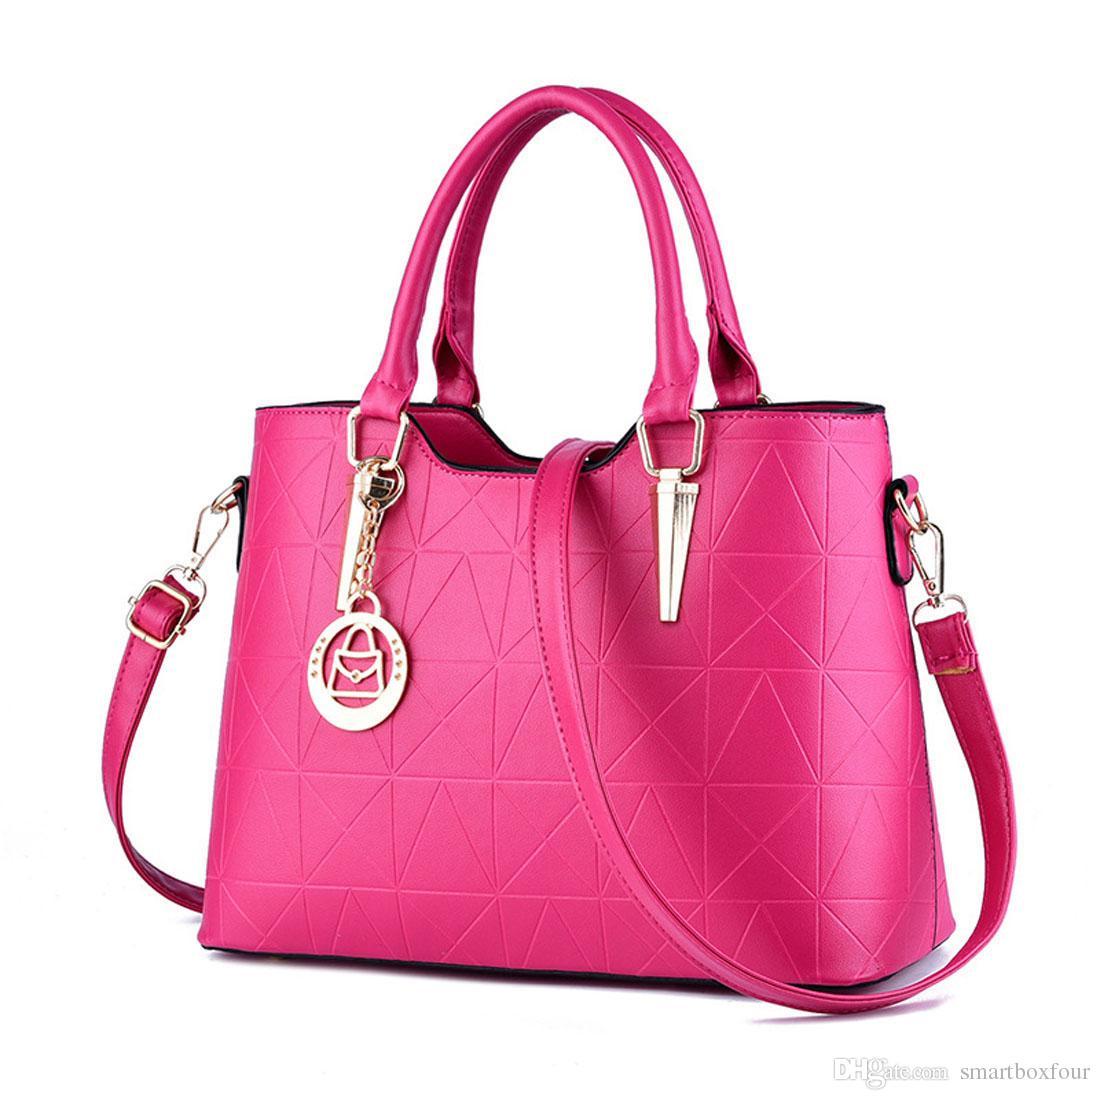 2017 New Style Popular Top Handle Bags Designer Handbags ...